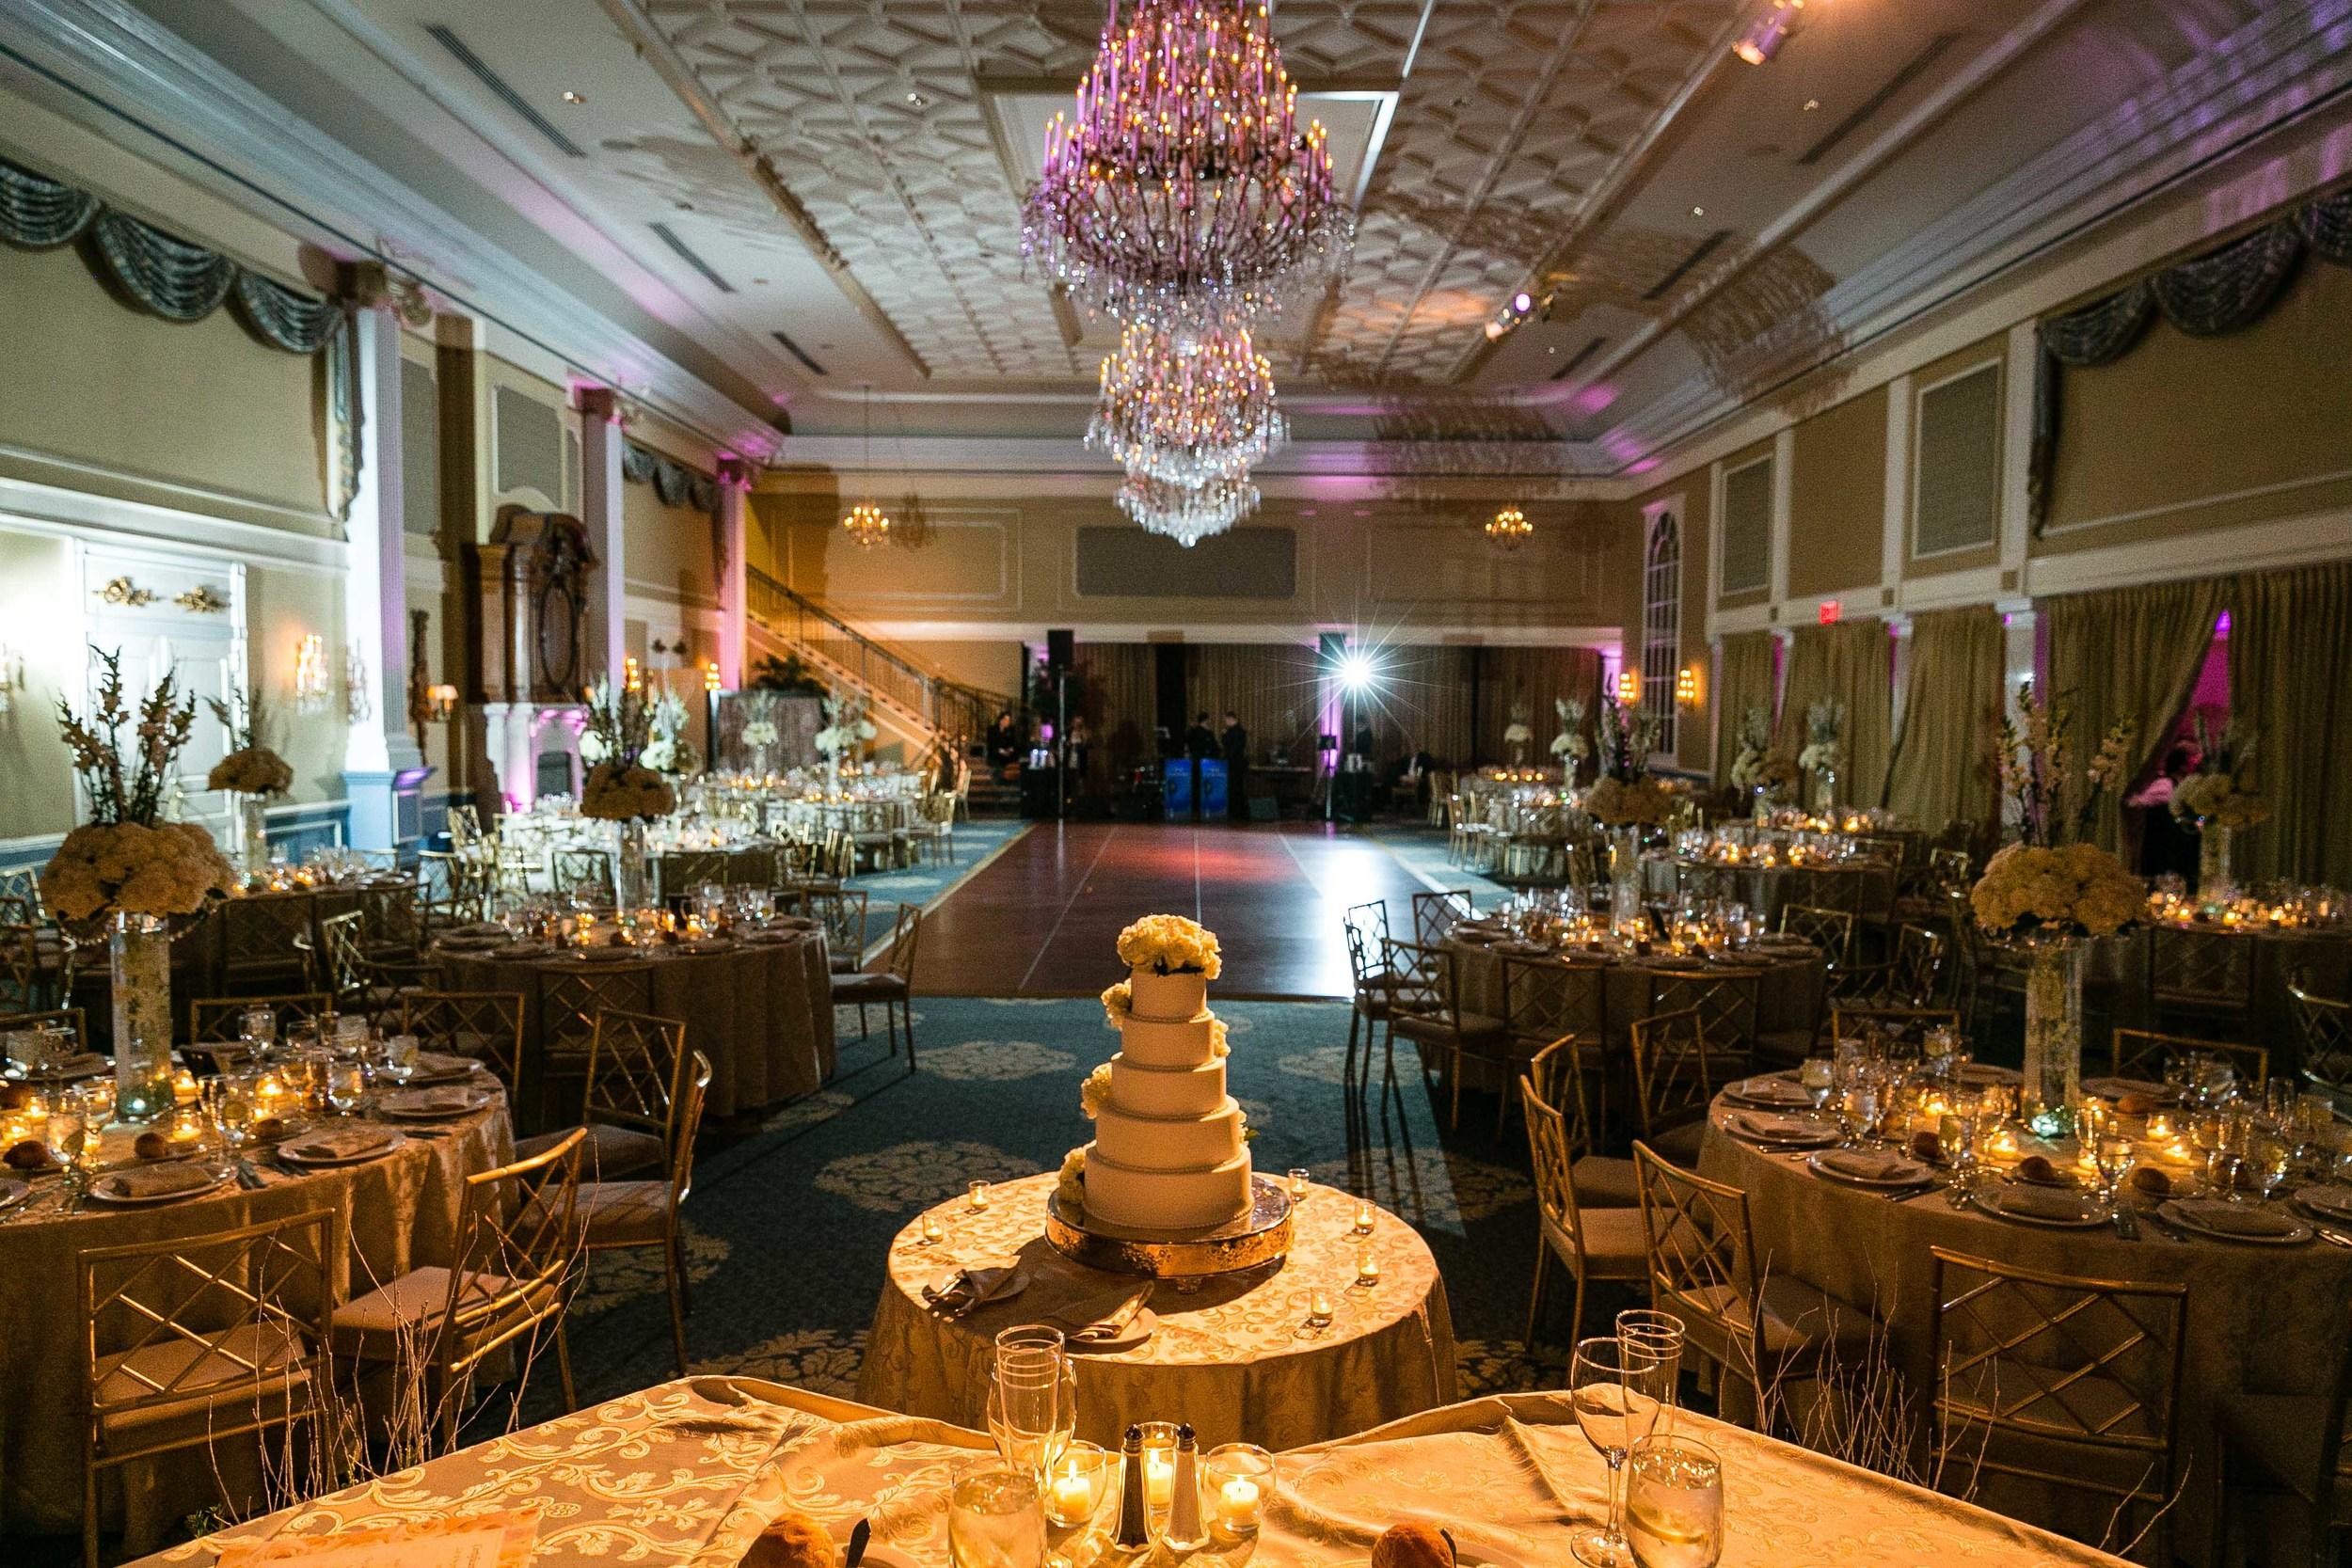 Russian-Jewish-Italian-Luxury-Wedding-The-Palace-at-Somerset-Park-NJ-Documentary-Wedding-Photography-2.jpg